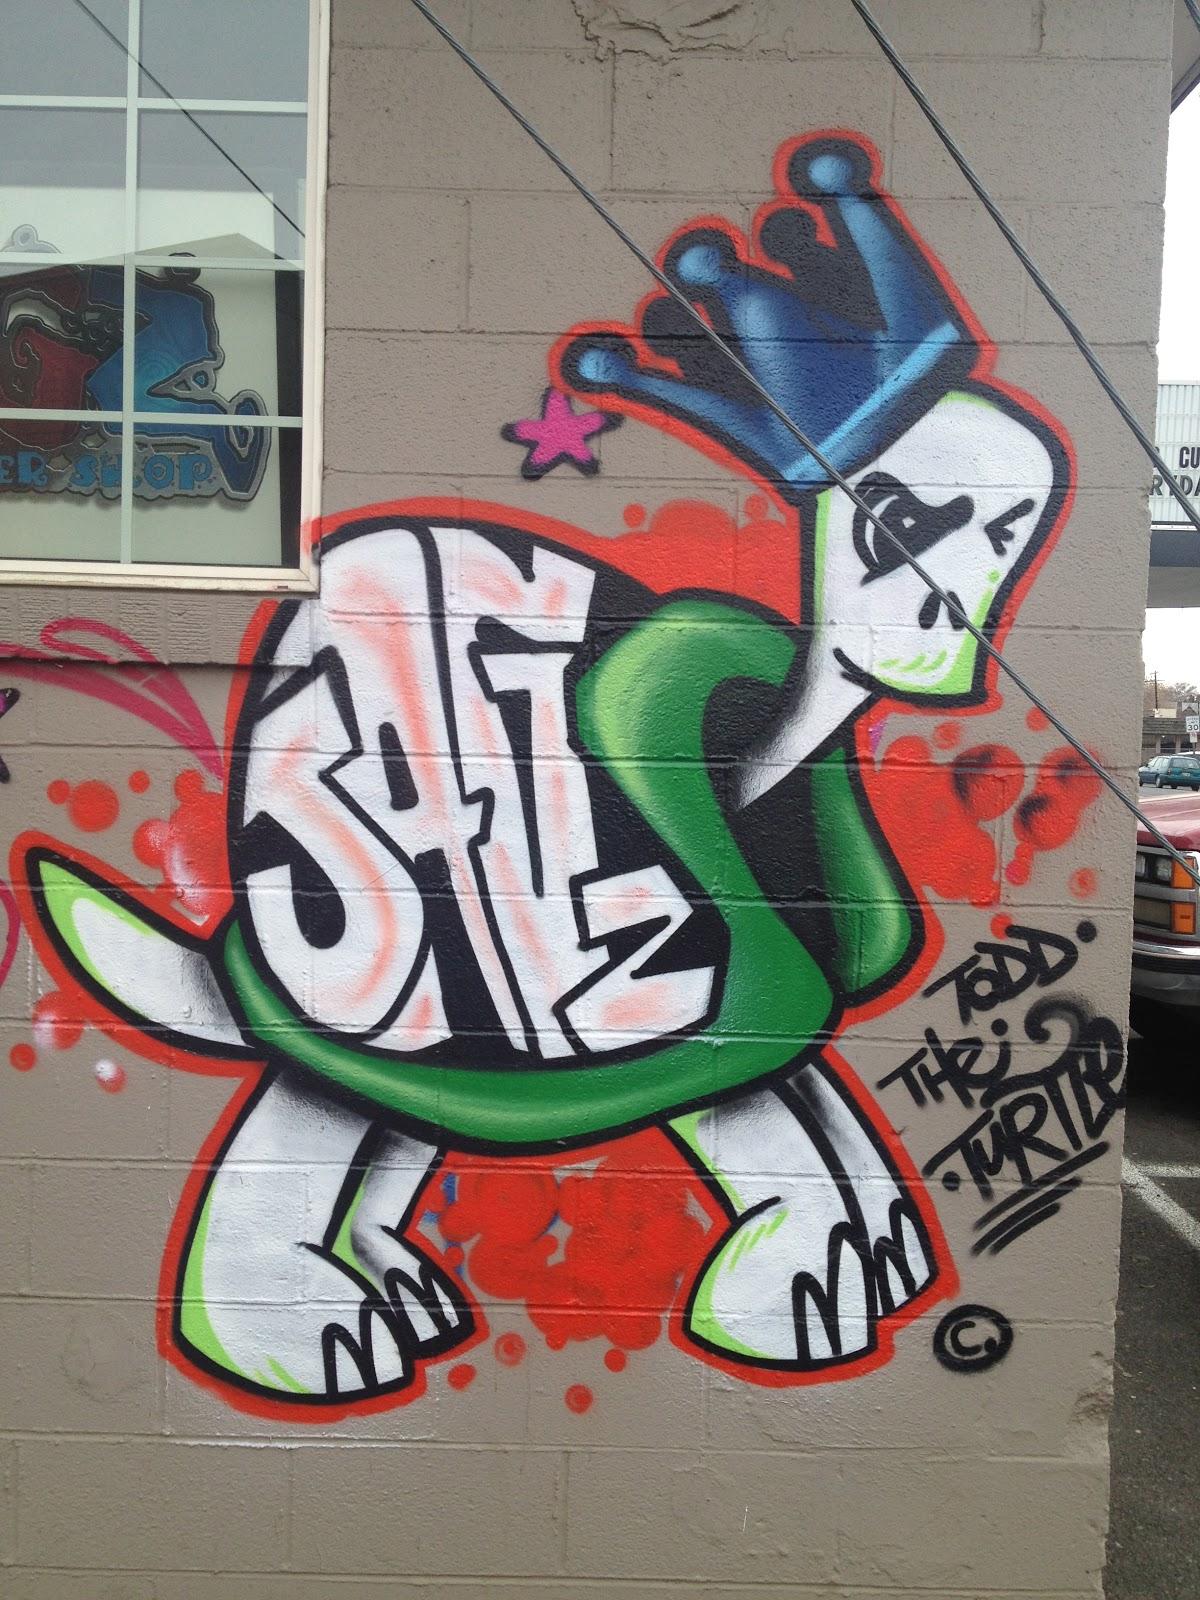 Rachel Dorn Ceramic Sculpture: Graffiti and Street Art